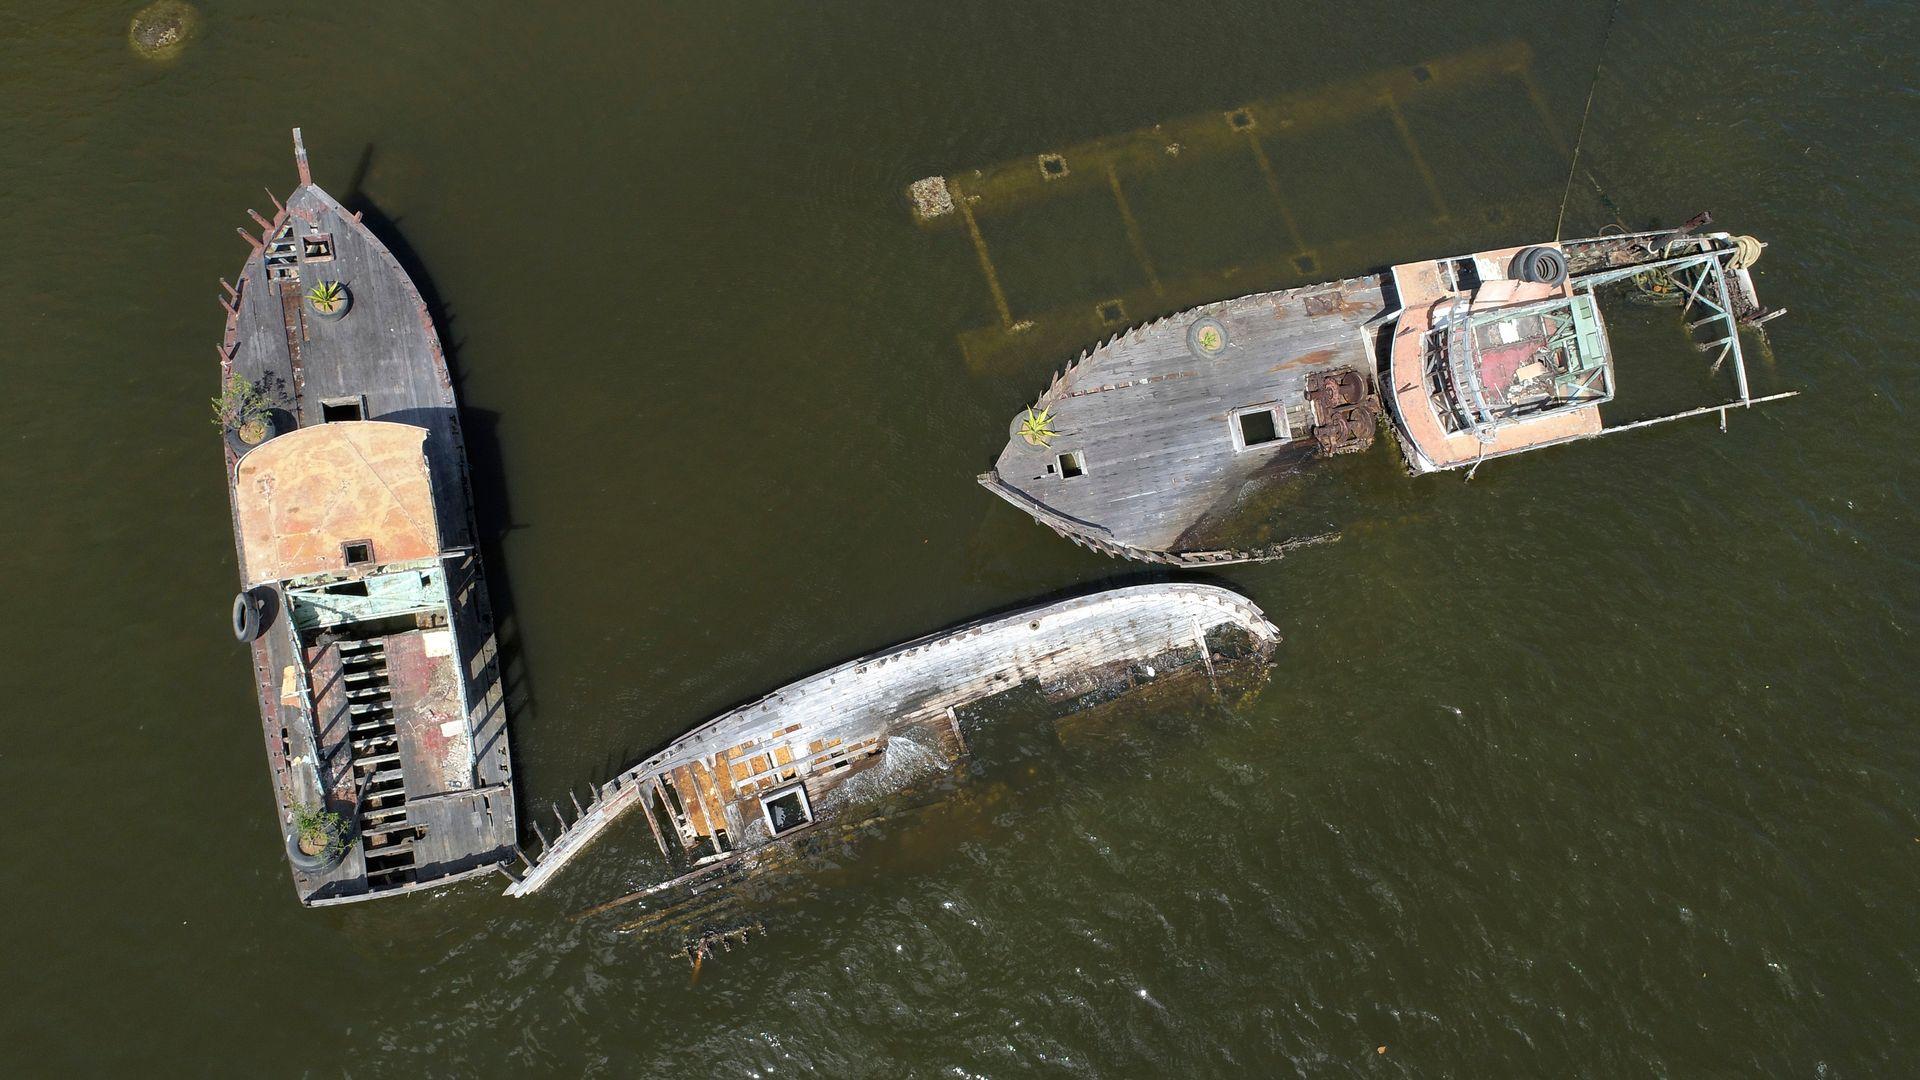 Aos poucos a água vai invadindo os barcos até atingir o convés.